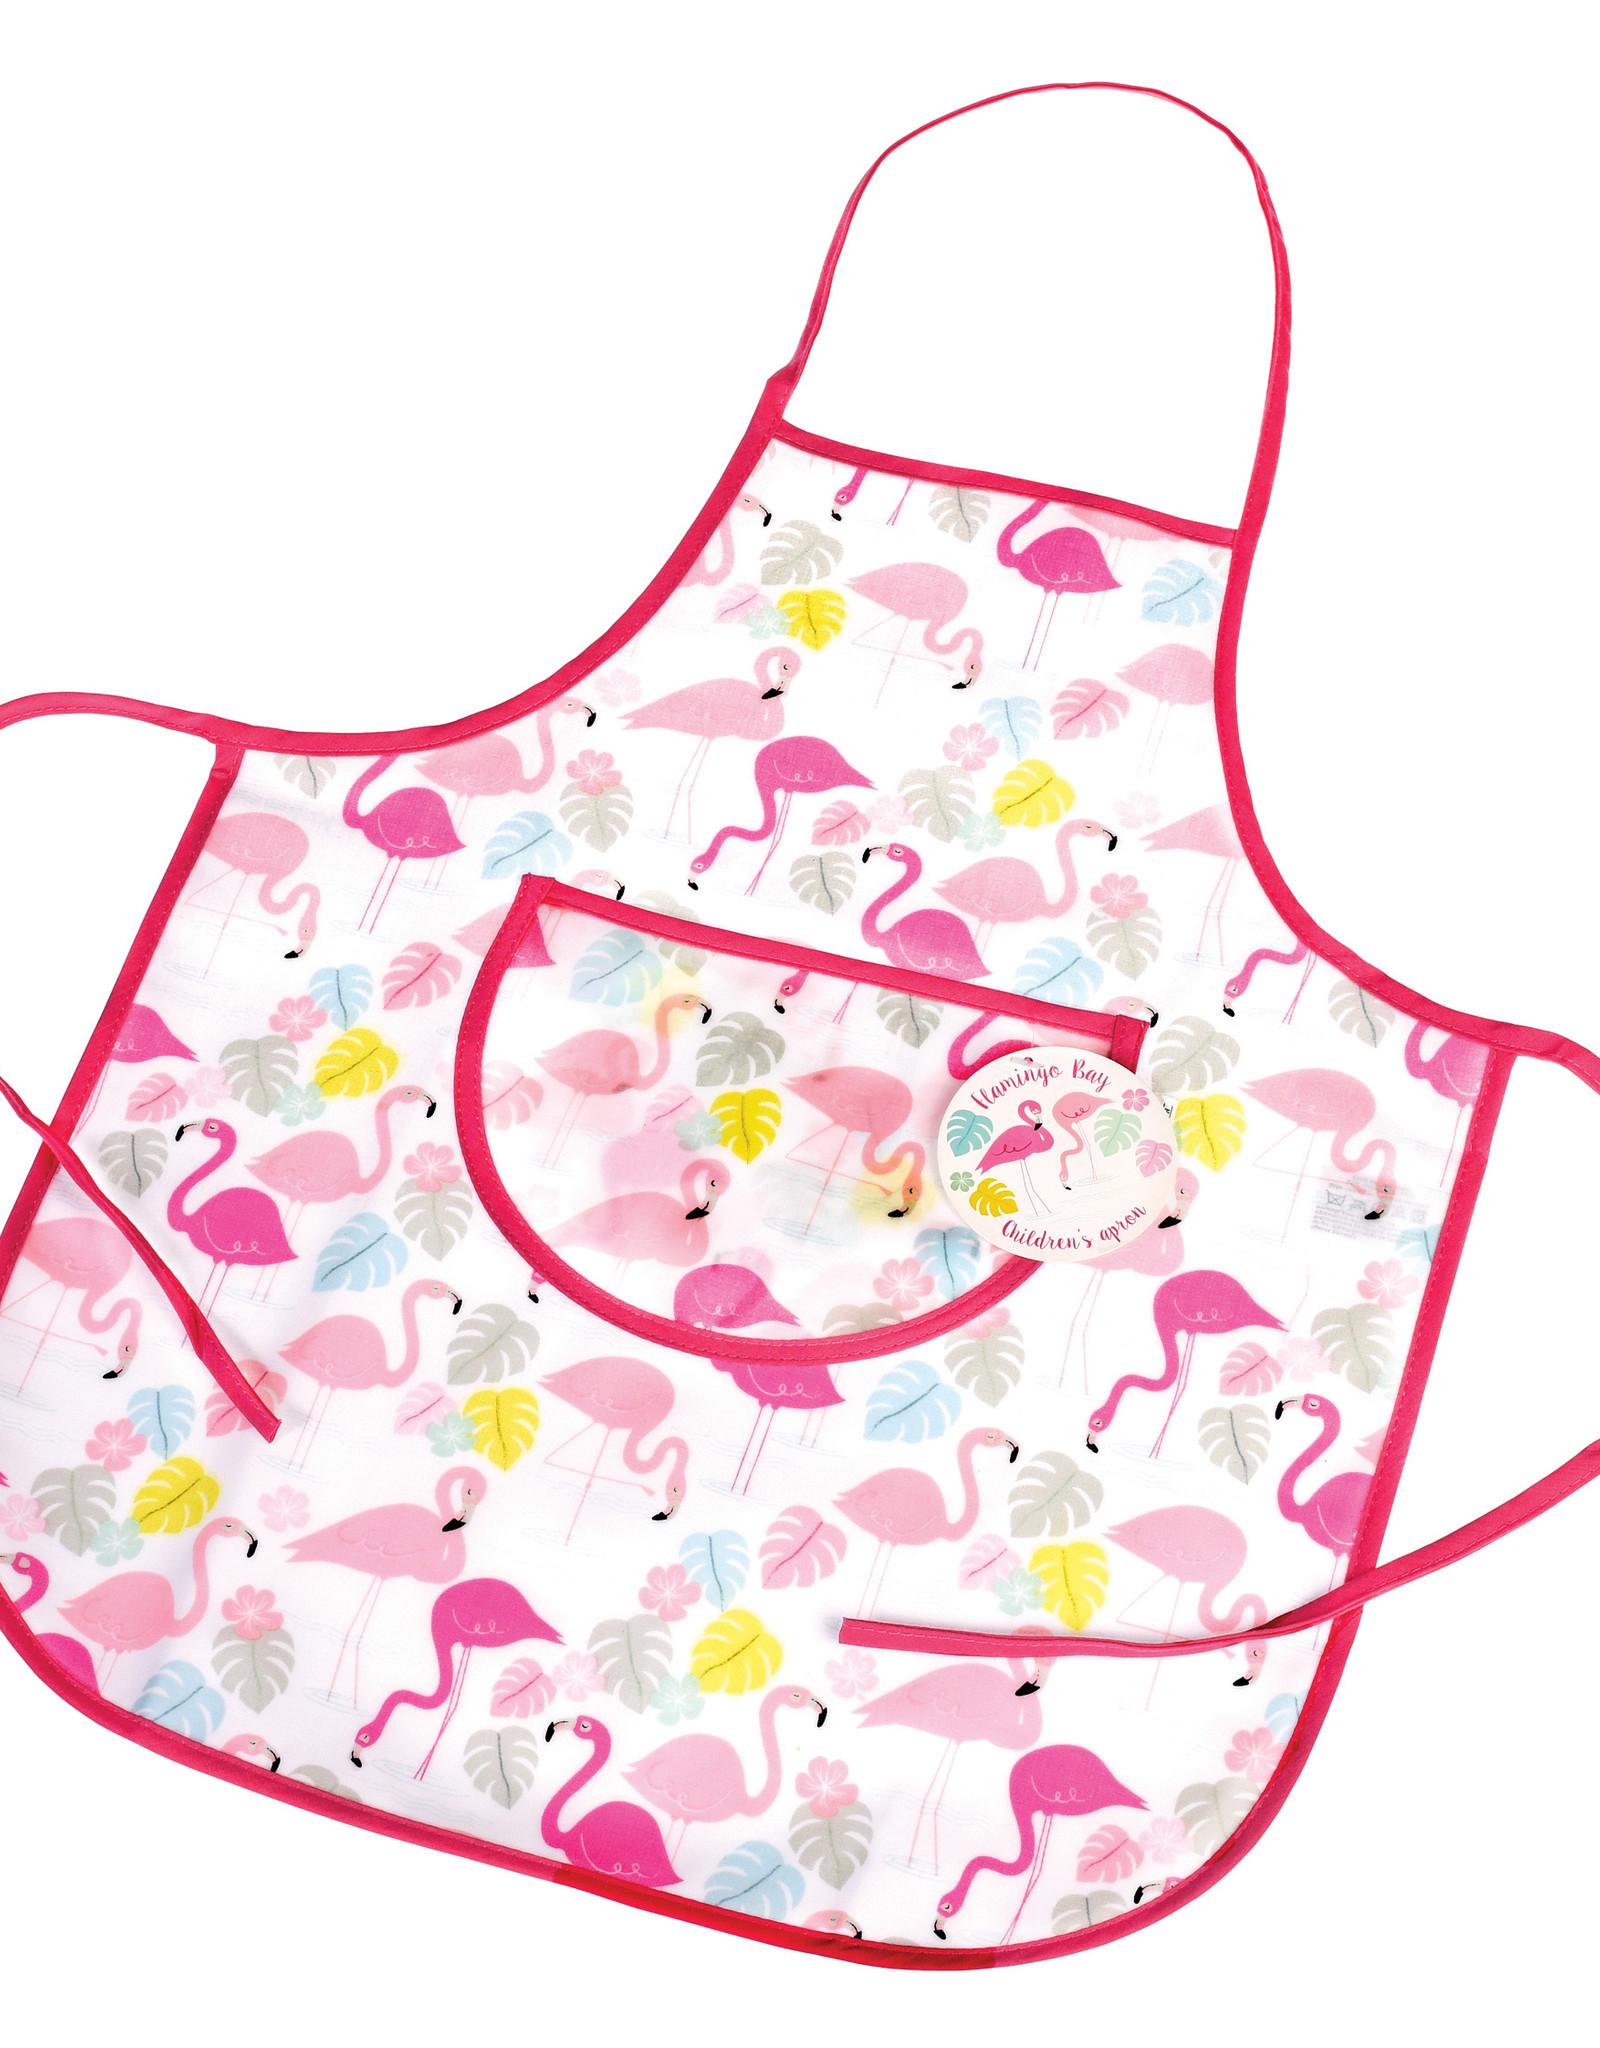 Rex London Kinderschort - Flamingo bay